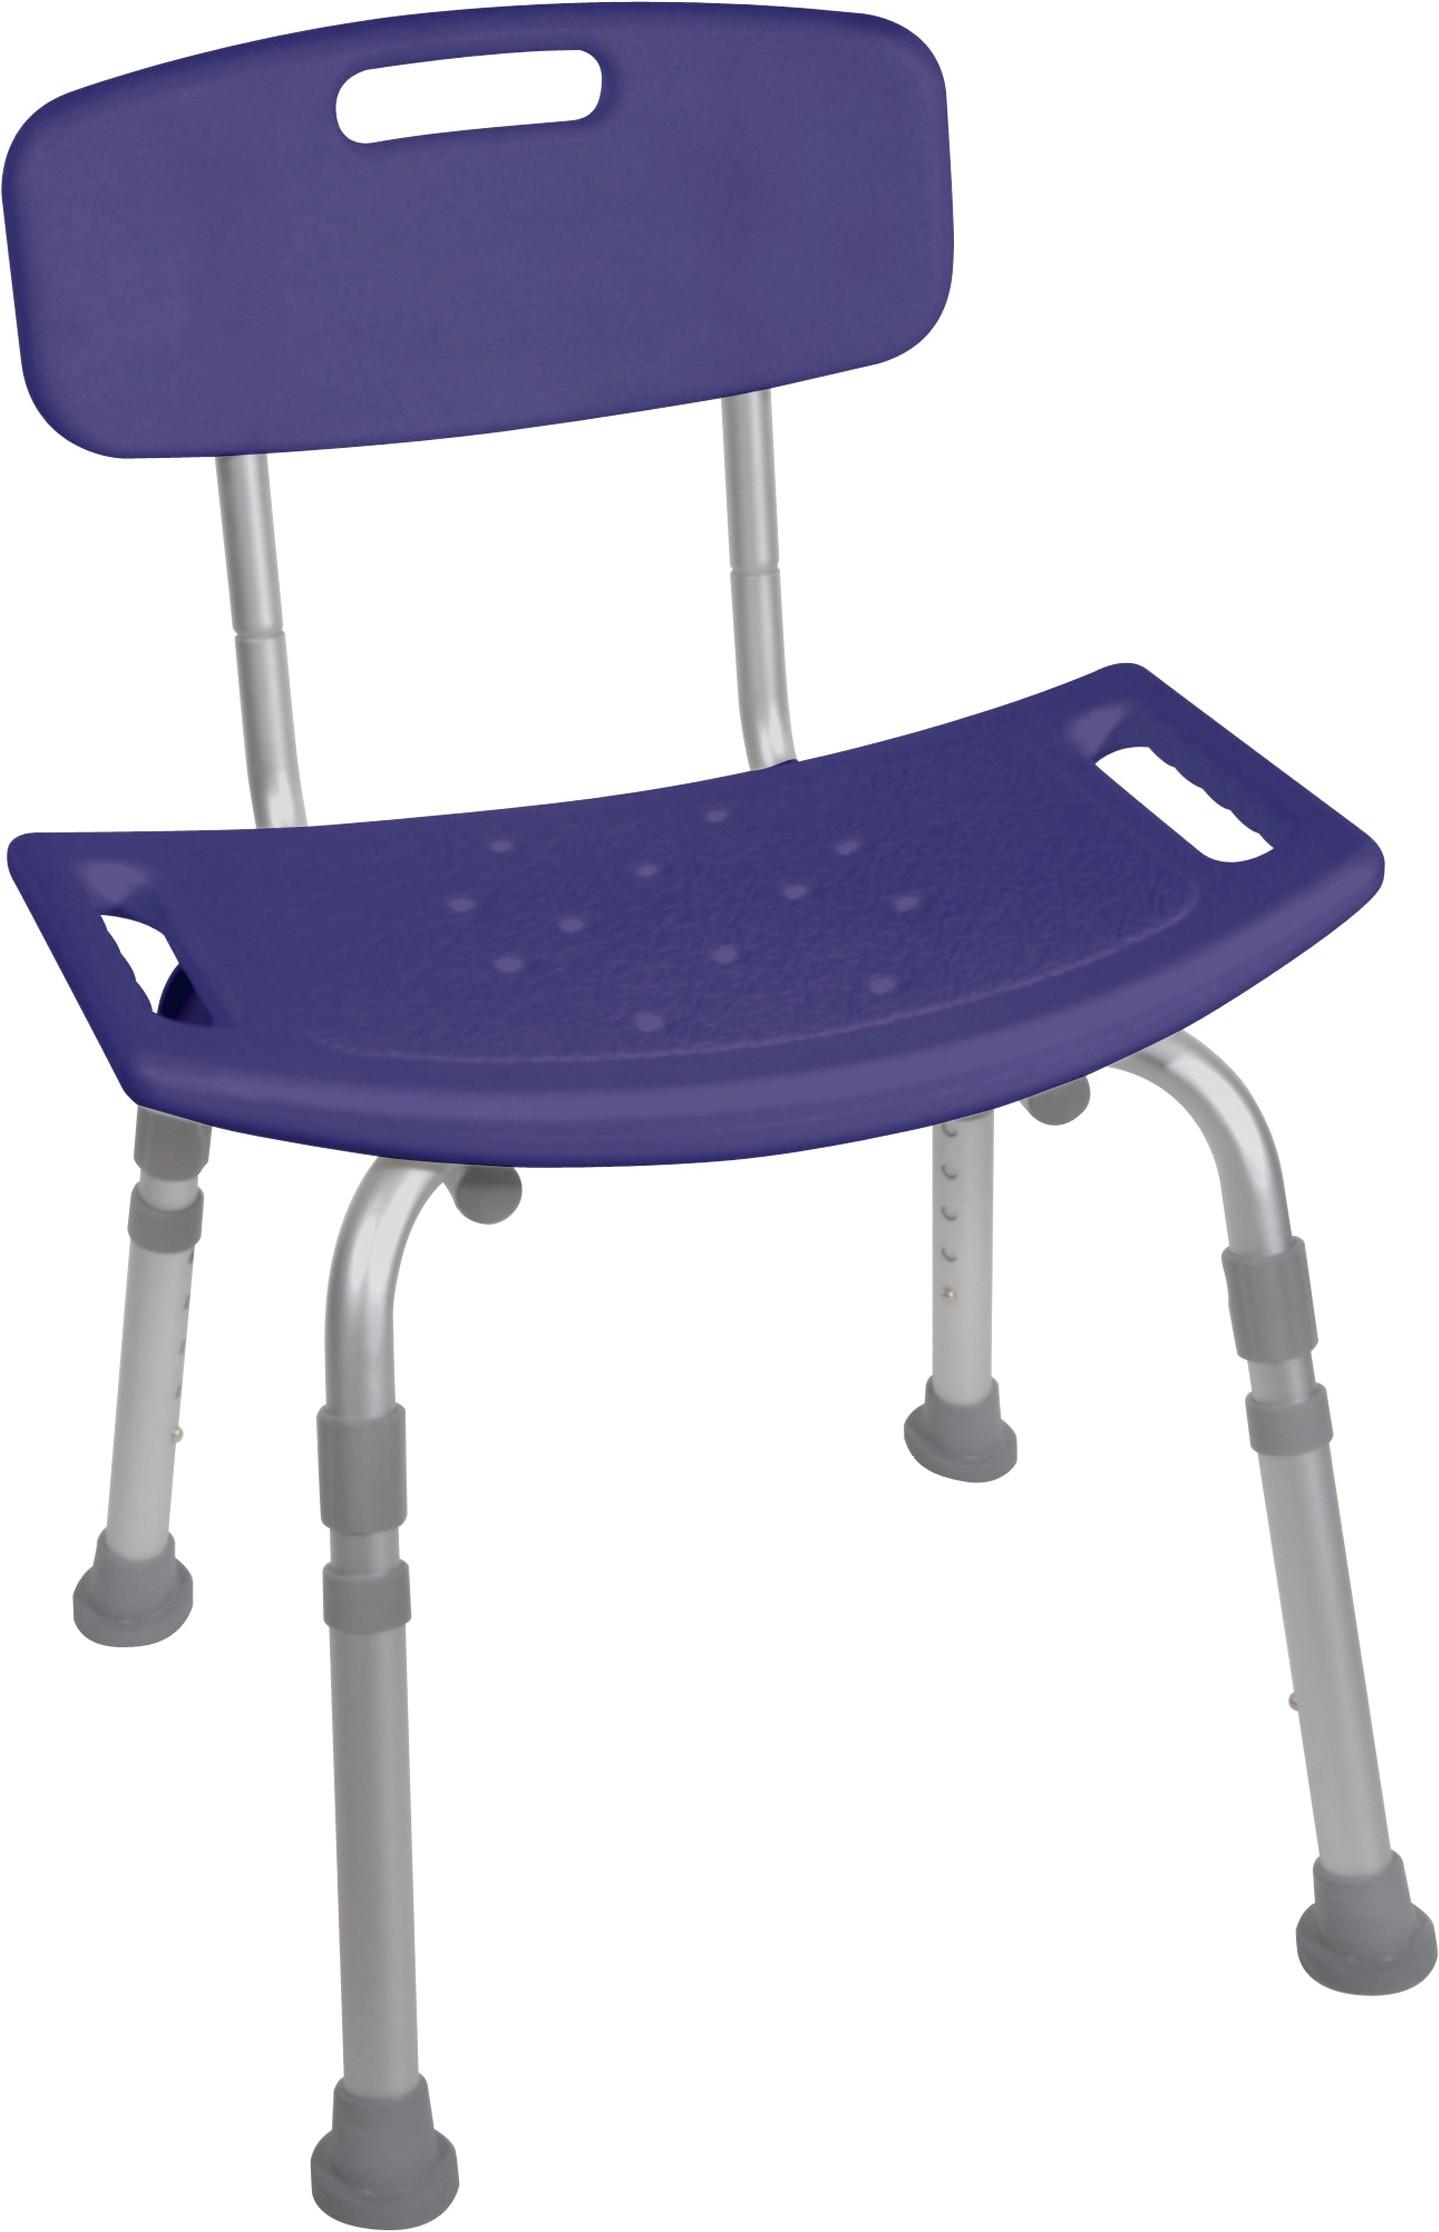 bathroom_safety_shower_tub_bench_chair_purple.jpg